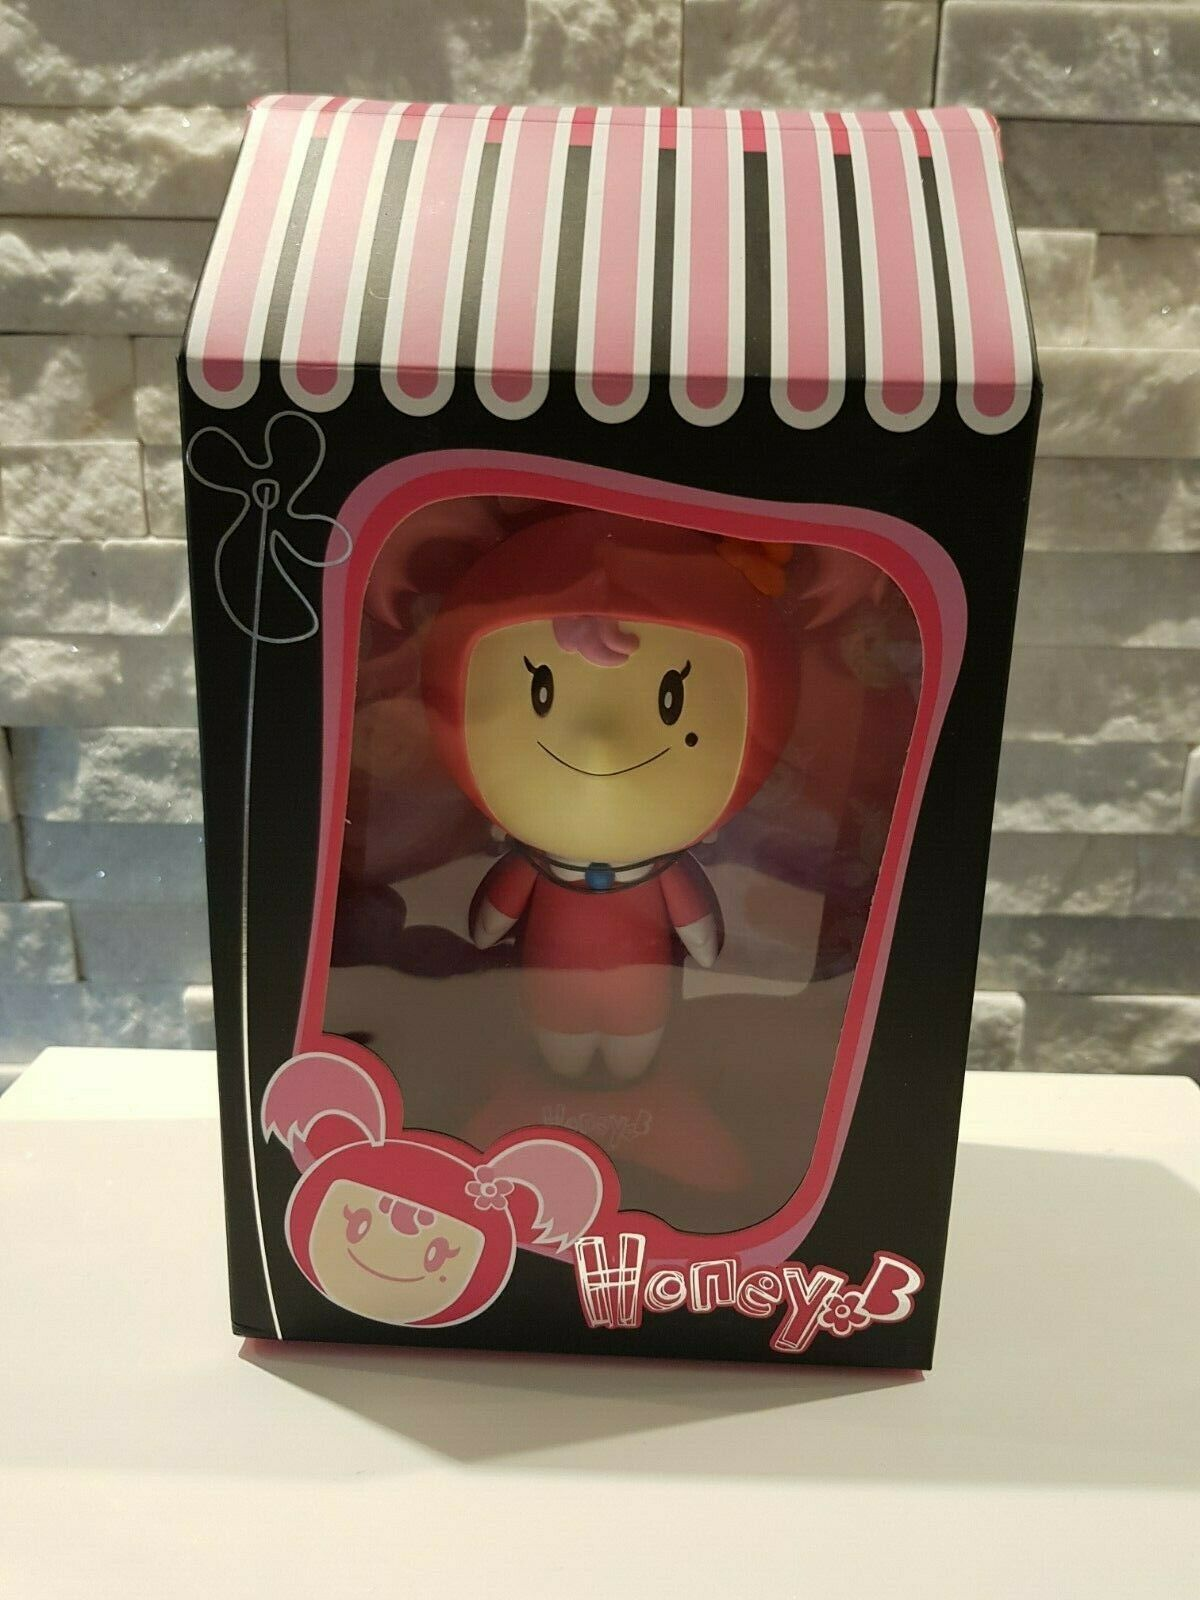 Metago giocattoli 2004  Honey B  Gary Thinre  Honey B cifra